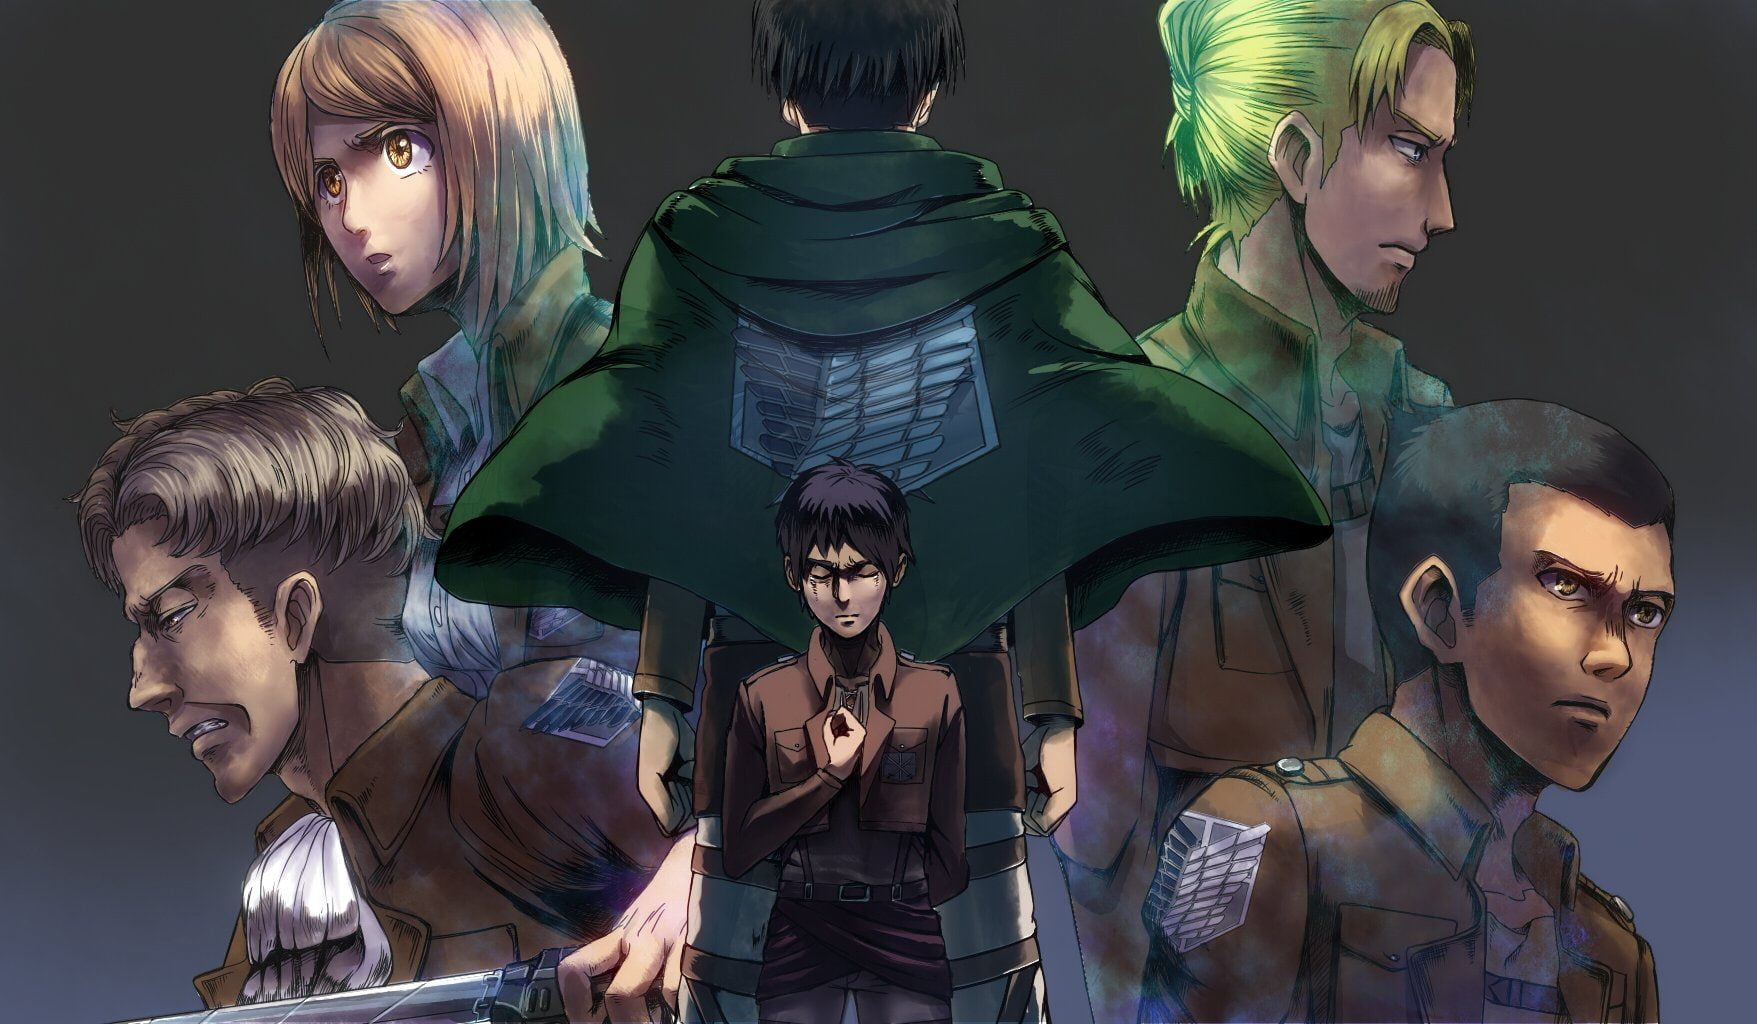 Anime Attack On Titan Attack on Titan Eren Yeager Gunther